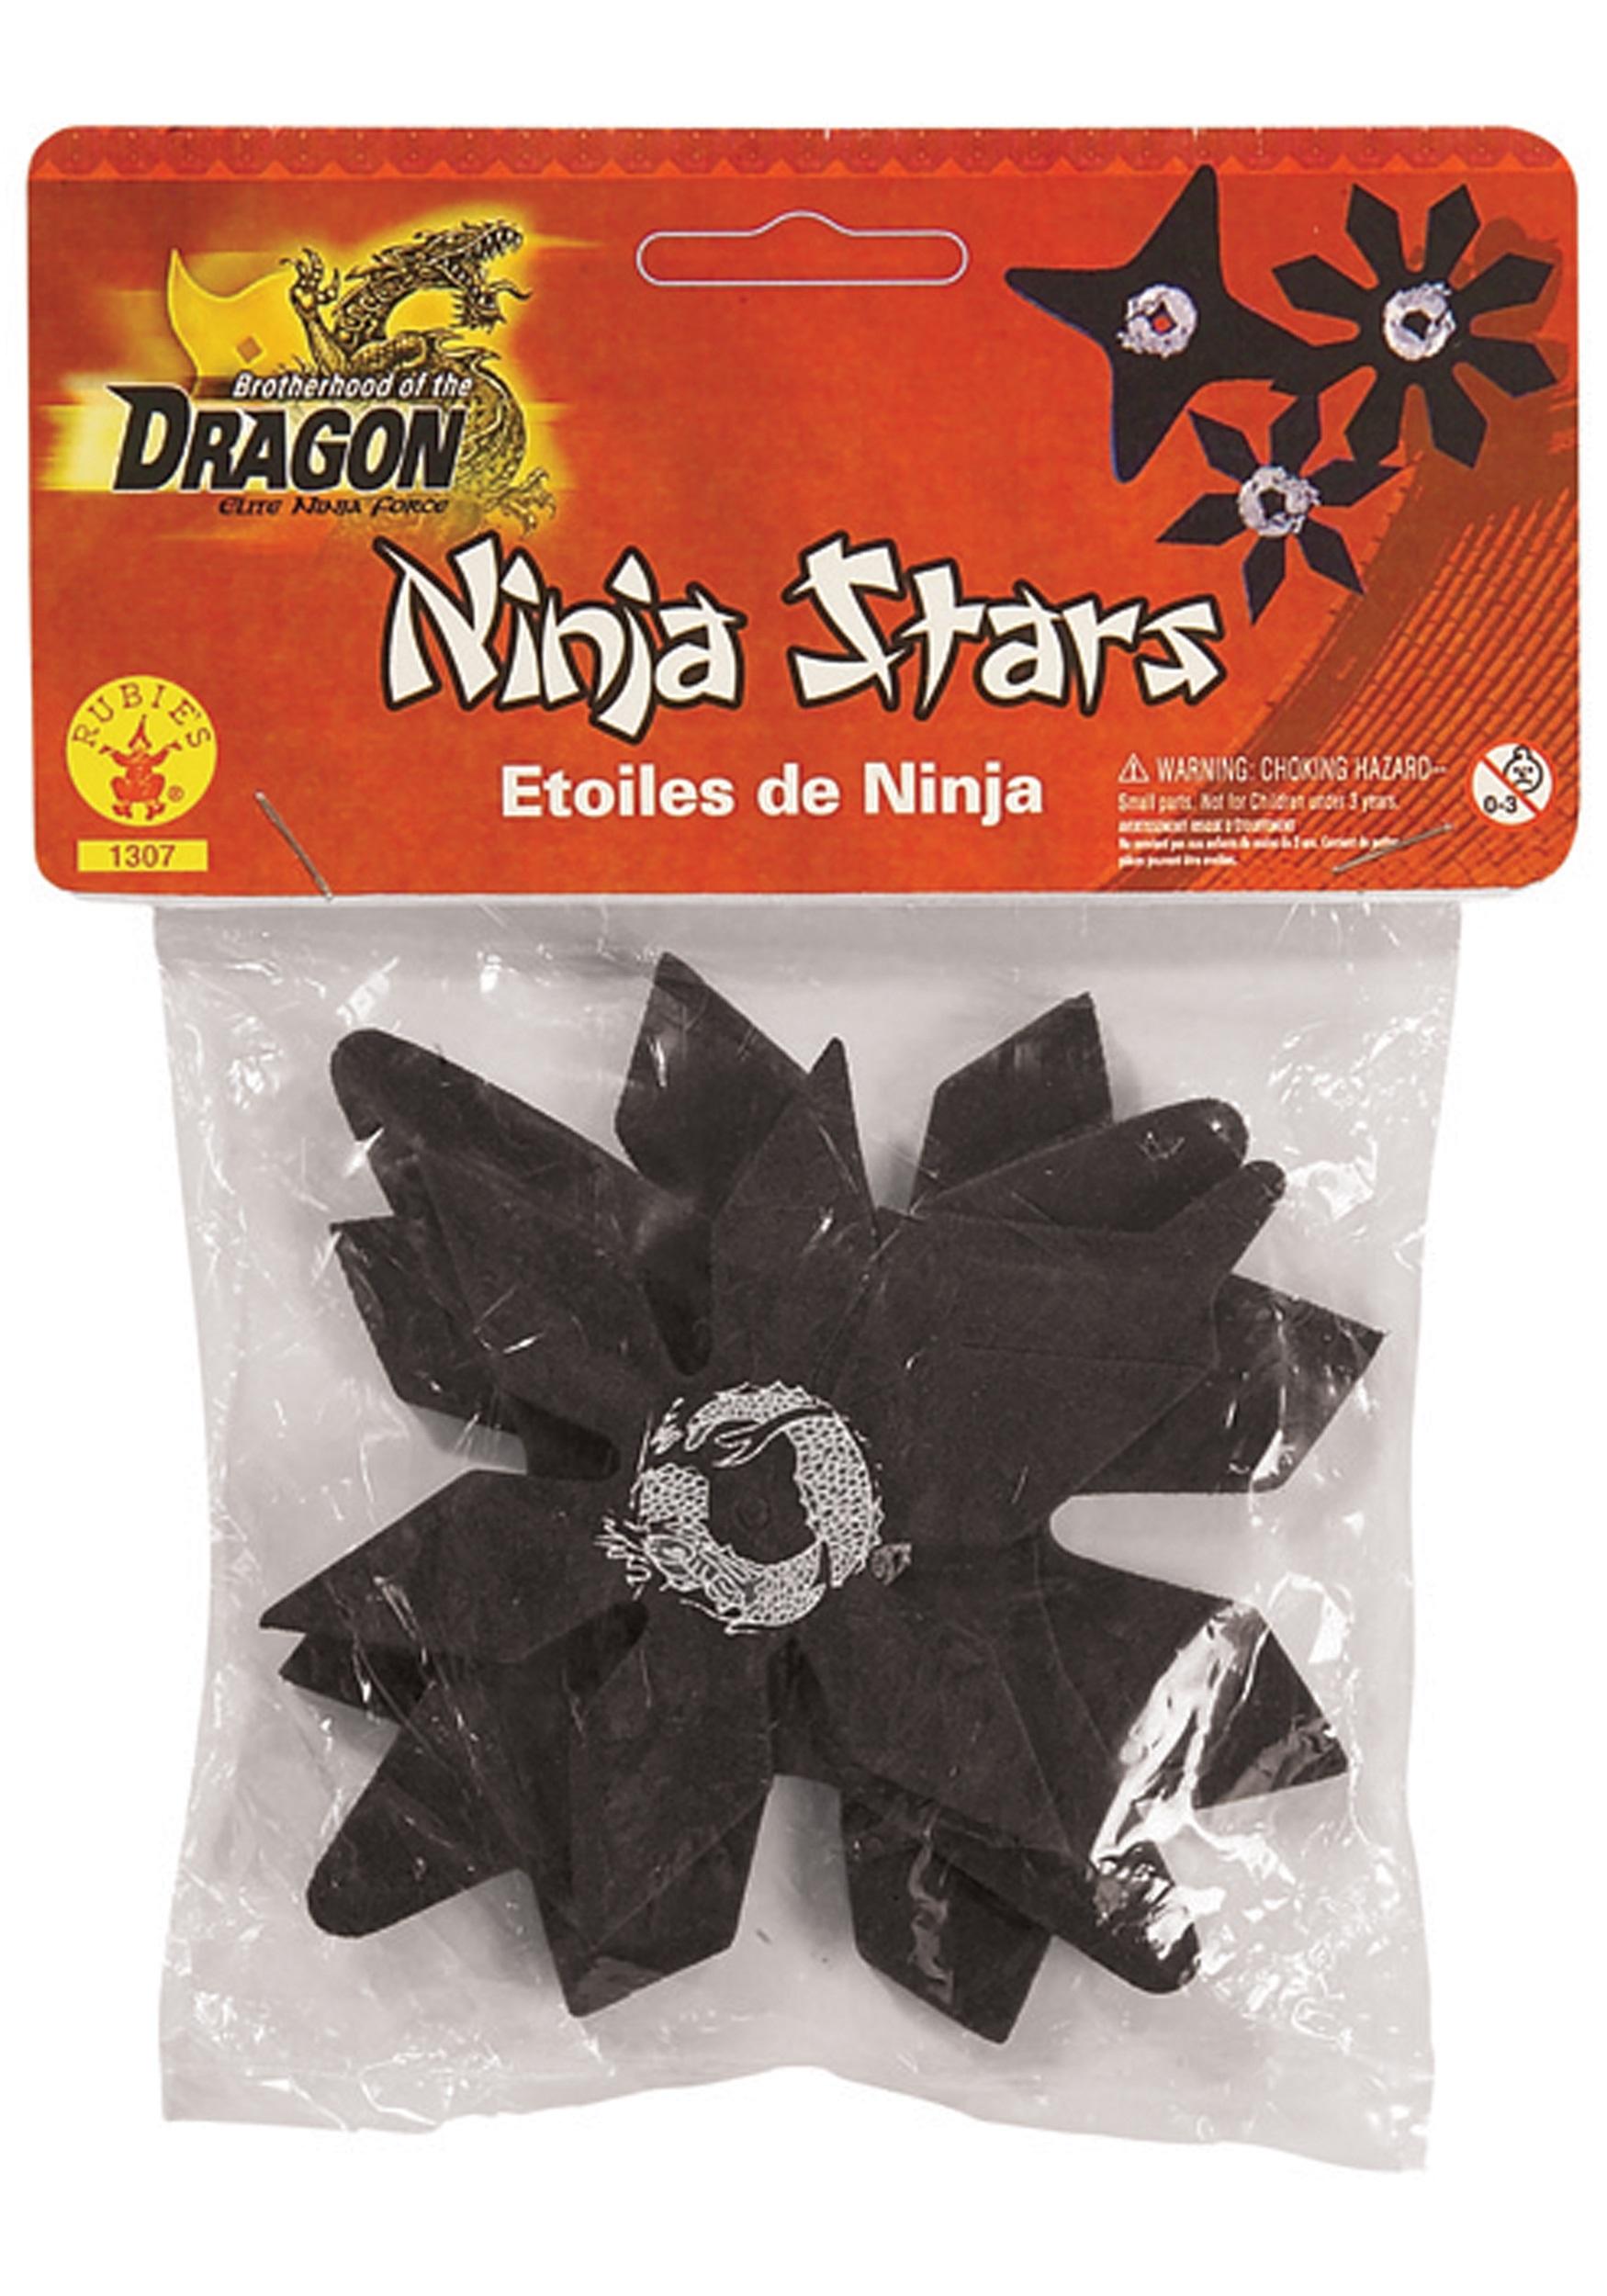 Black Ninja Stars RU1307